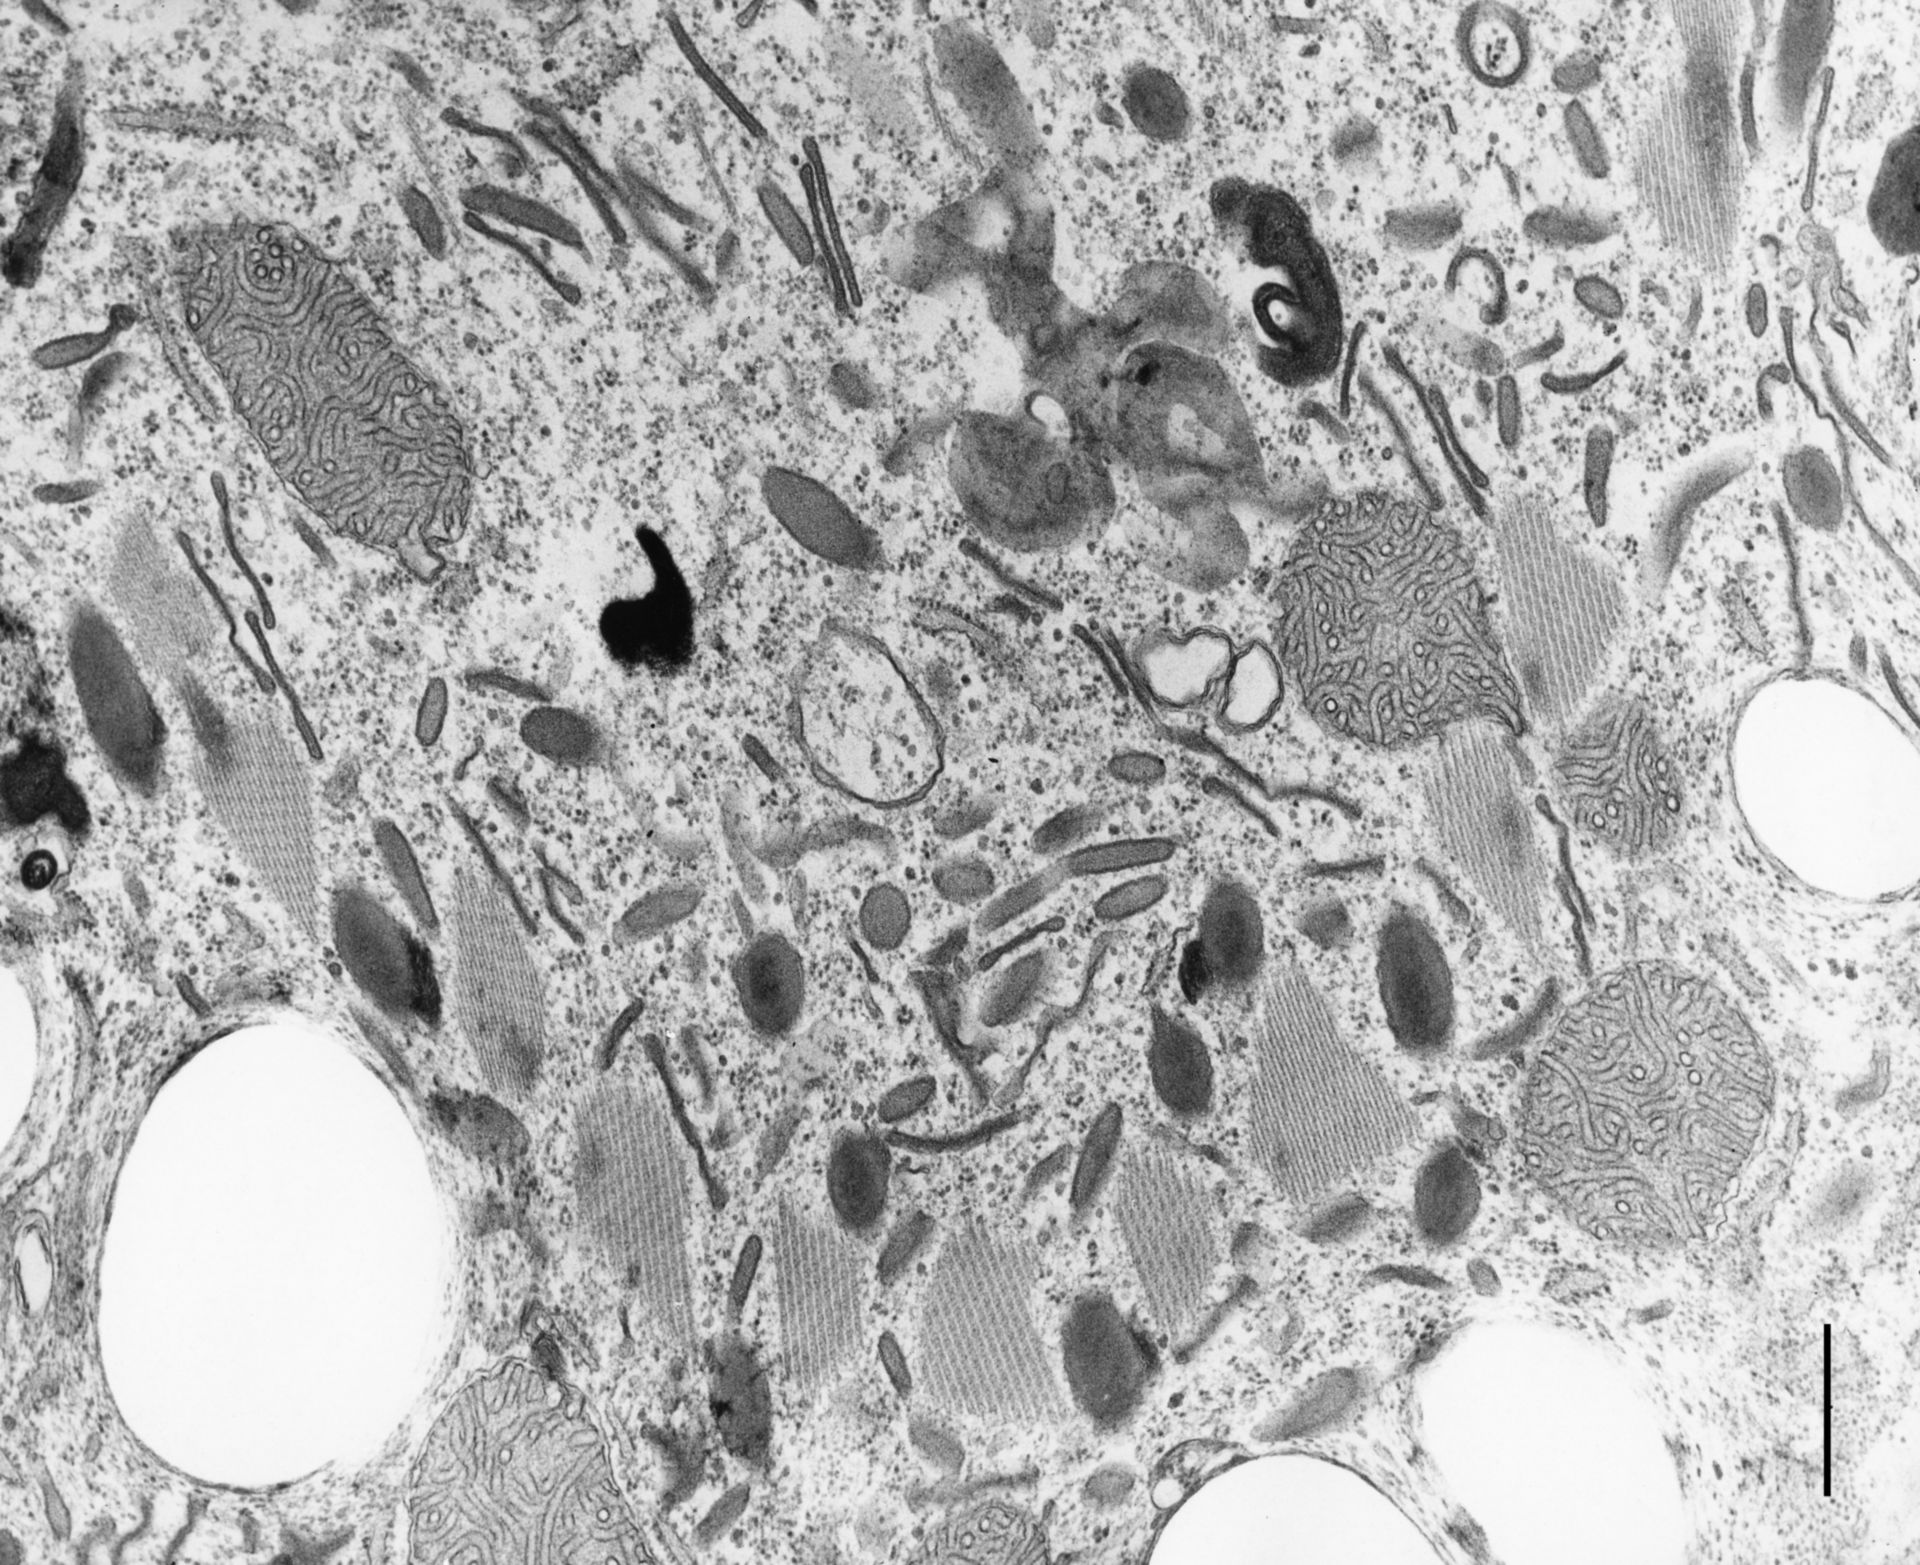 Coleps hirtus (Vacuoli digestivo) - CIL:9709